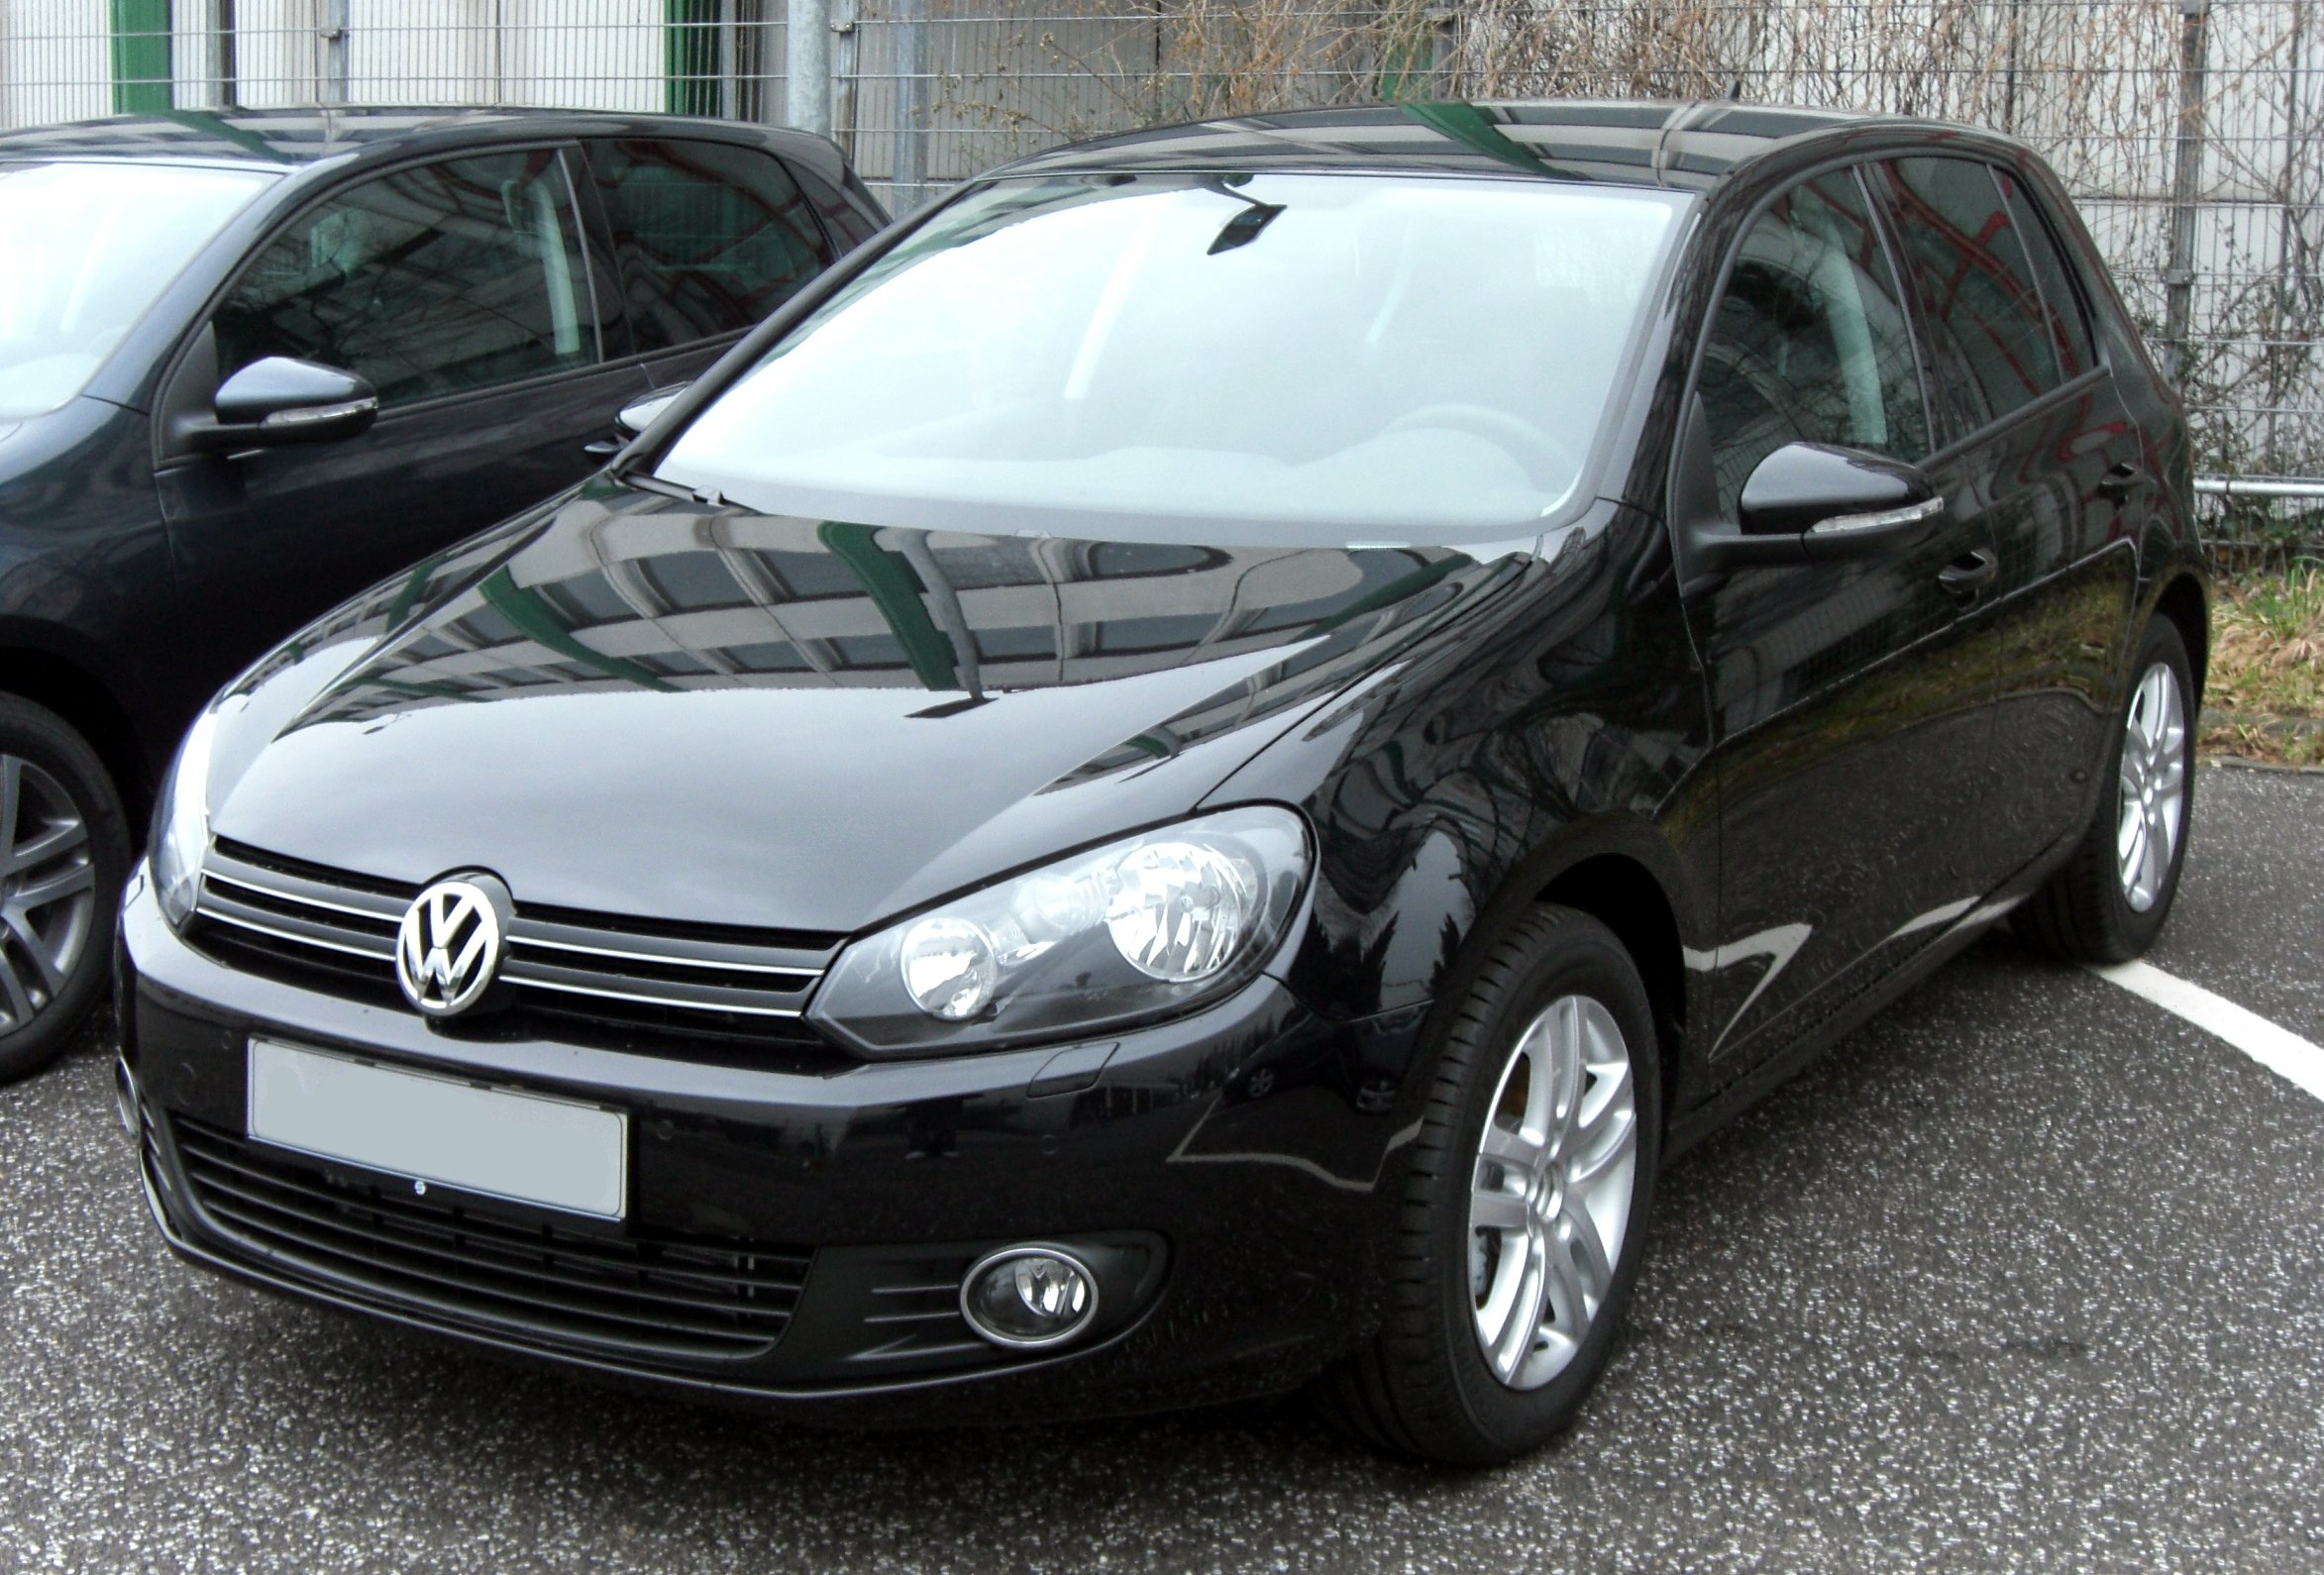 VW_Golf_VI_front